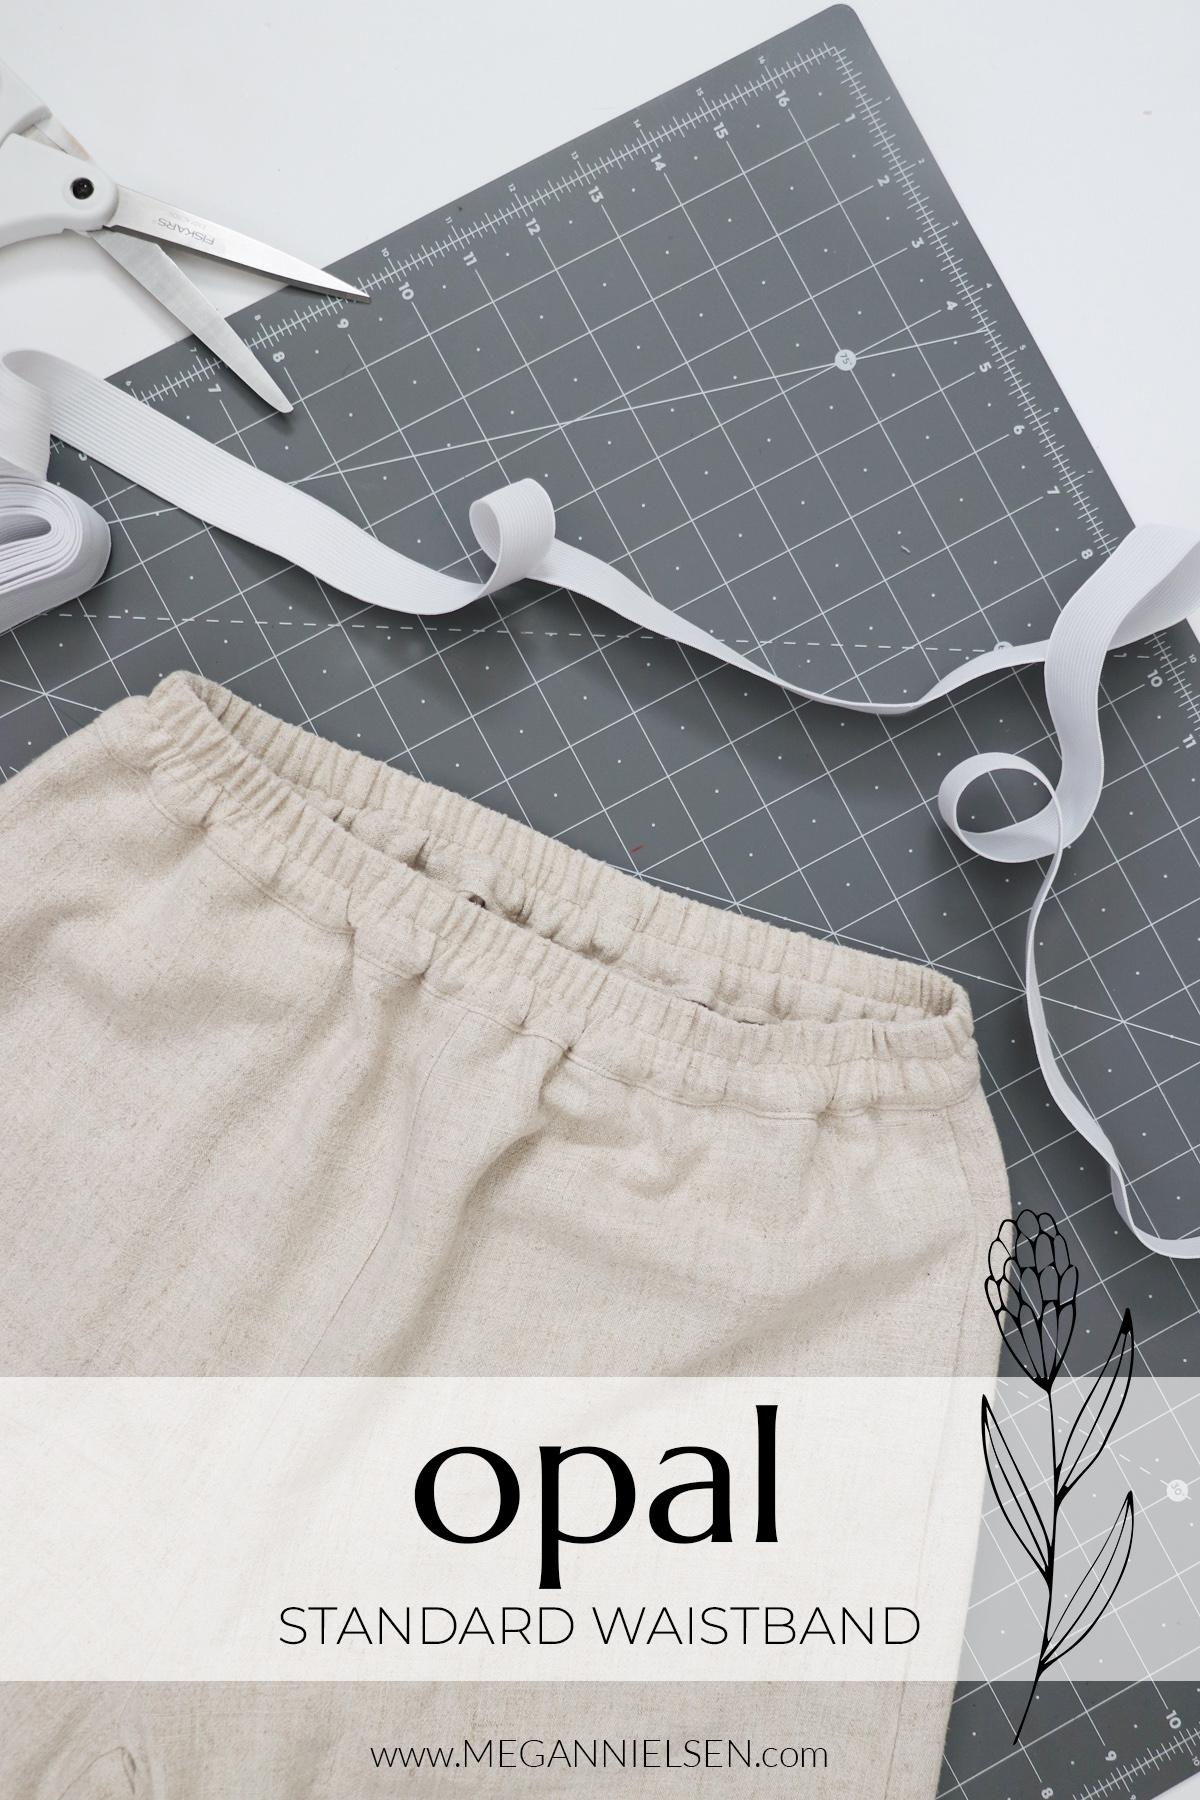 Opal sewalong standard waistband for the Opal pants and shorts pattern